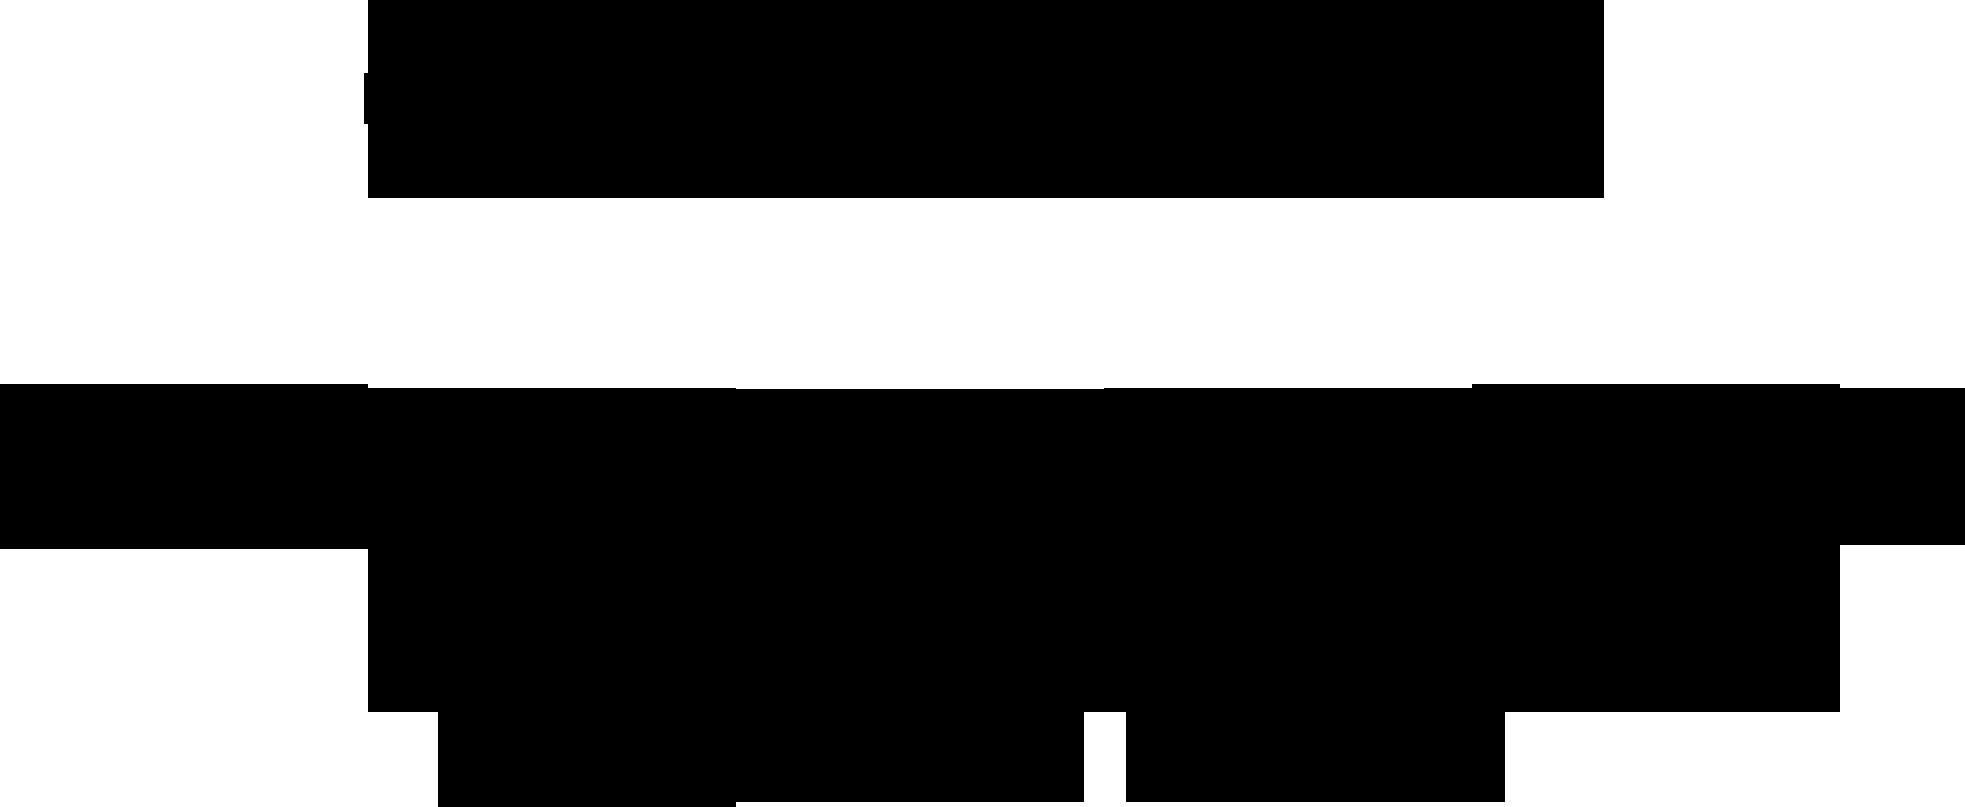 ODD FELLOW BLACK